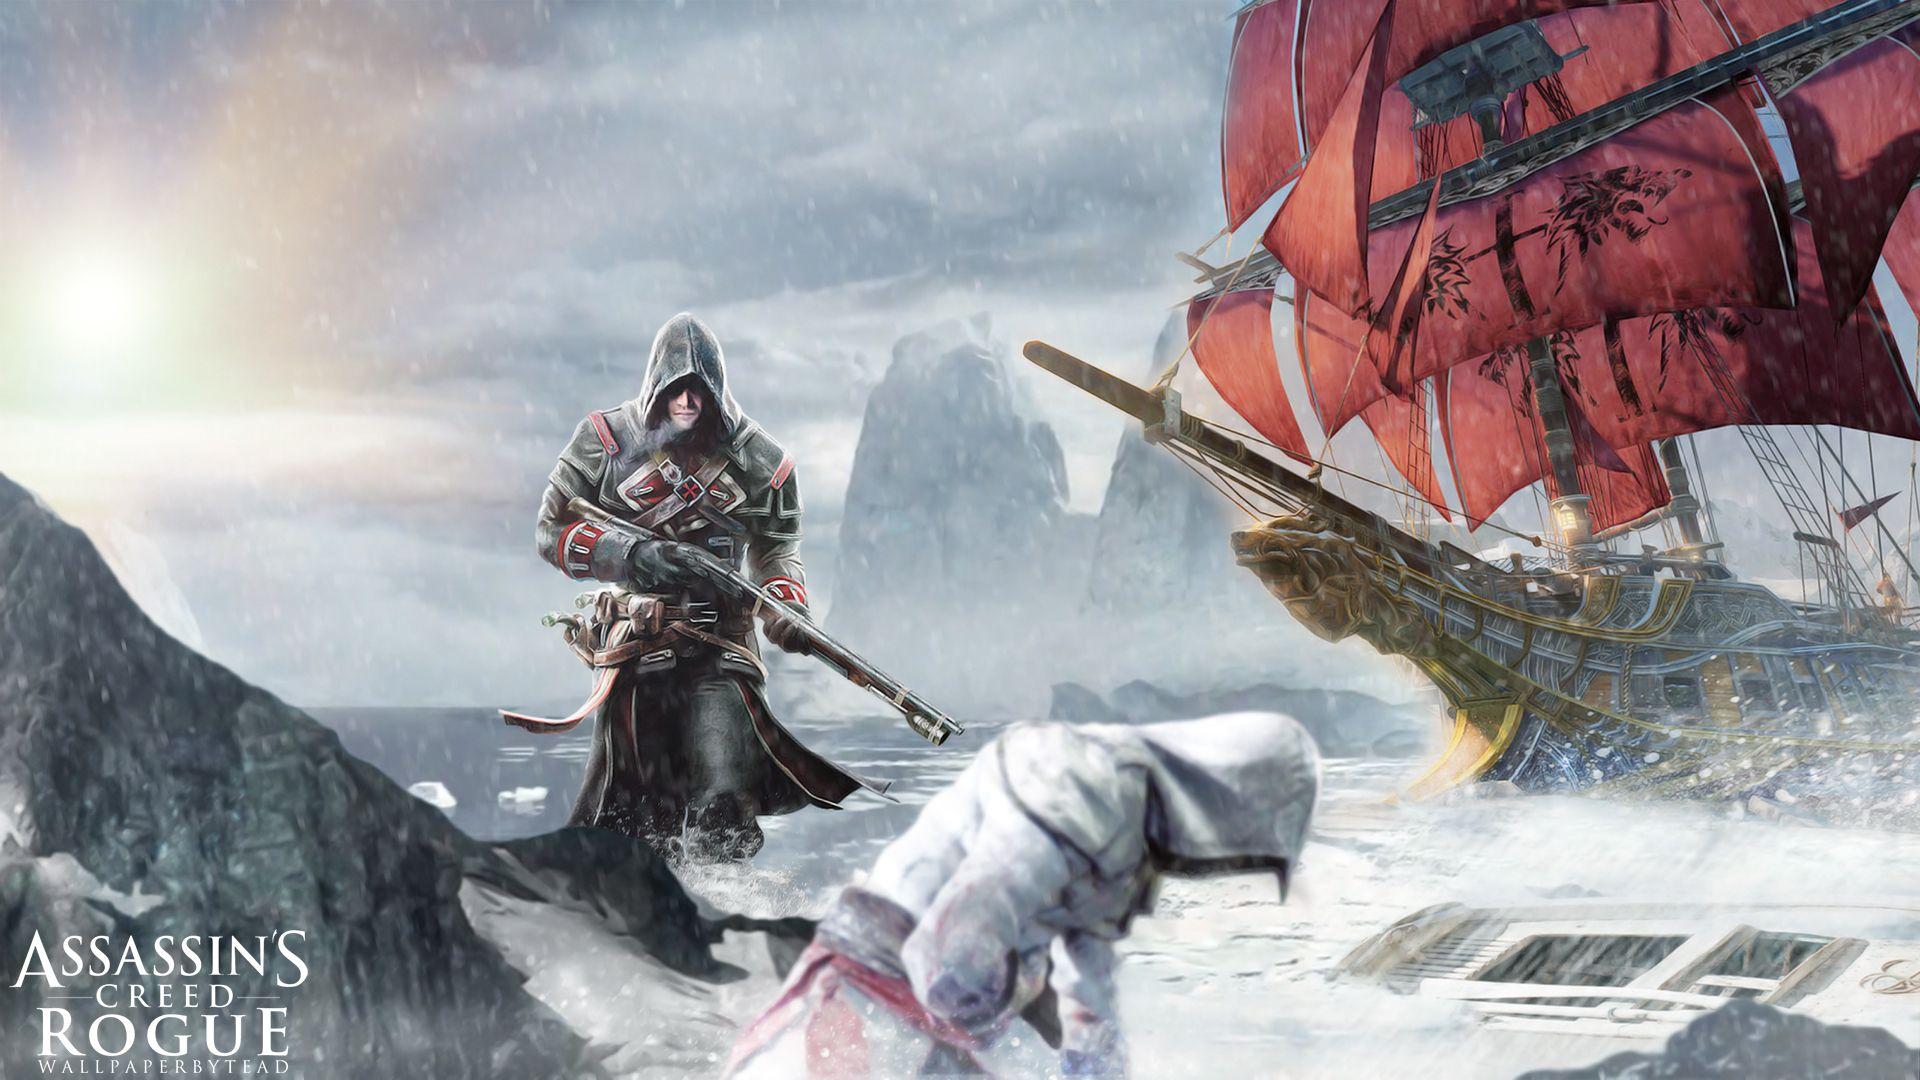 Assassins Creed Rogue Wallpaper Full HD x Select Game ...